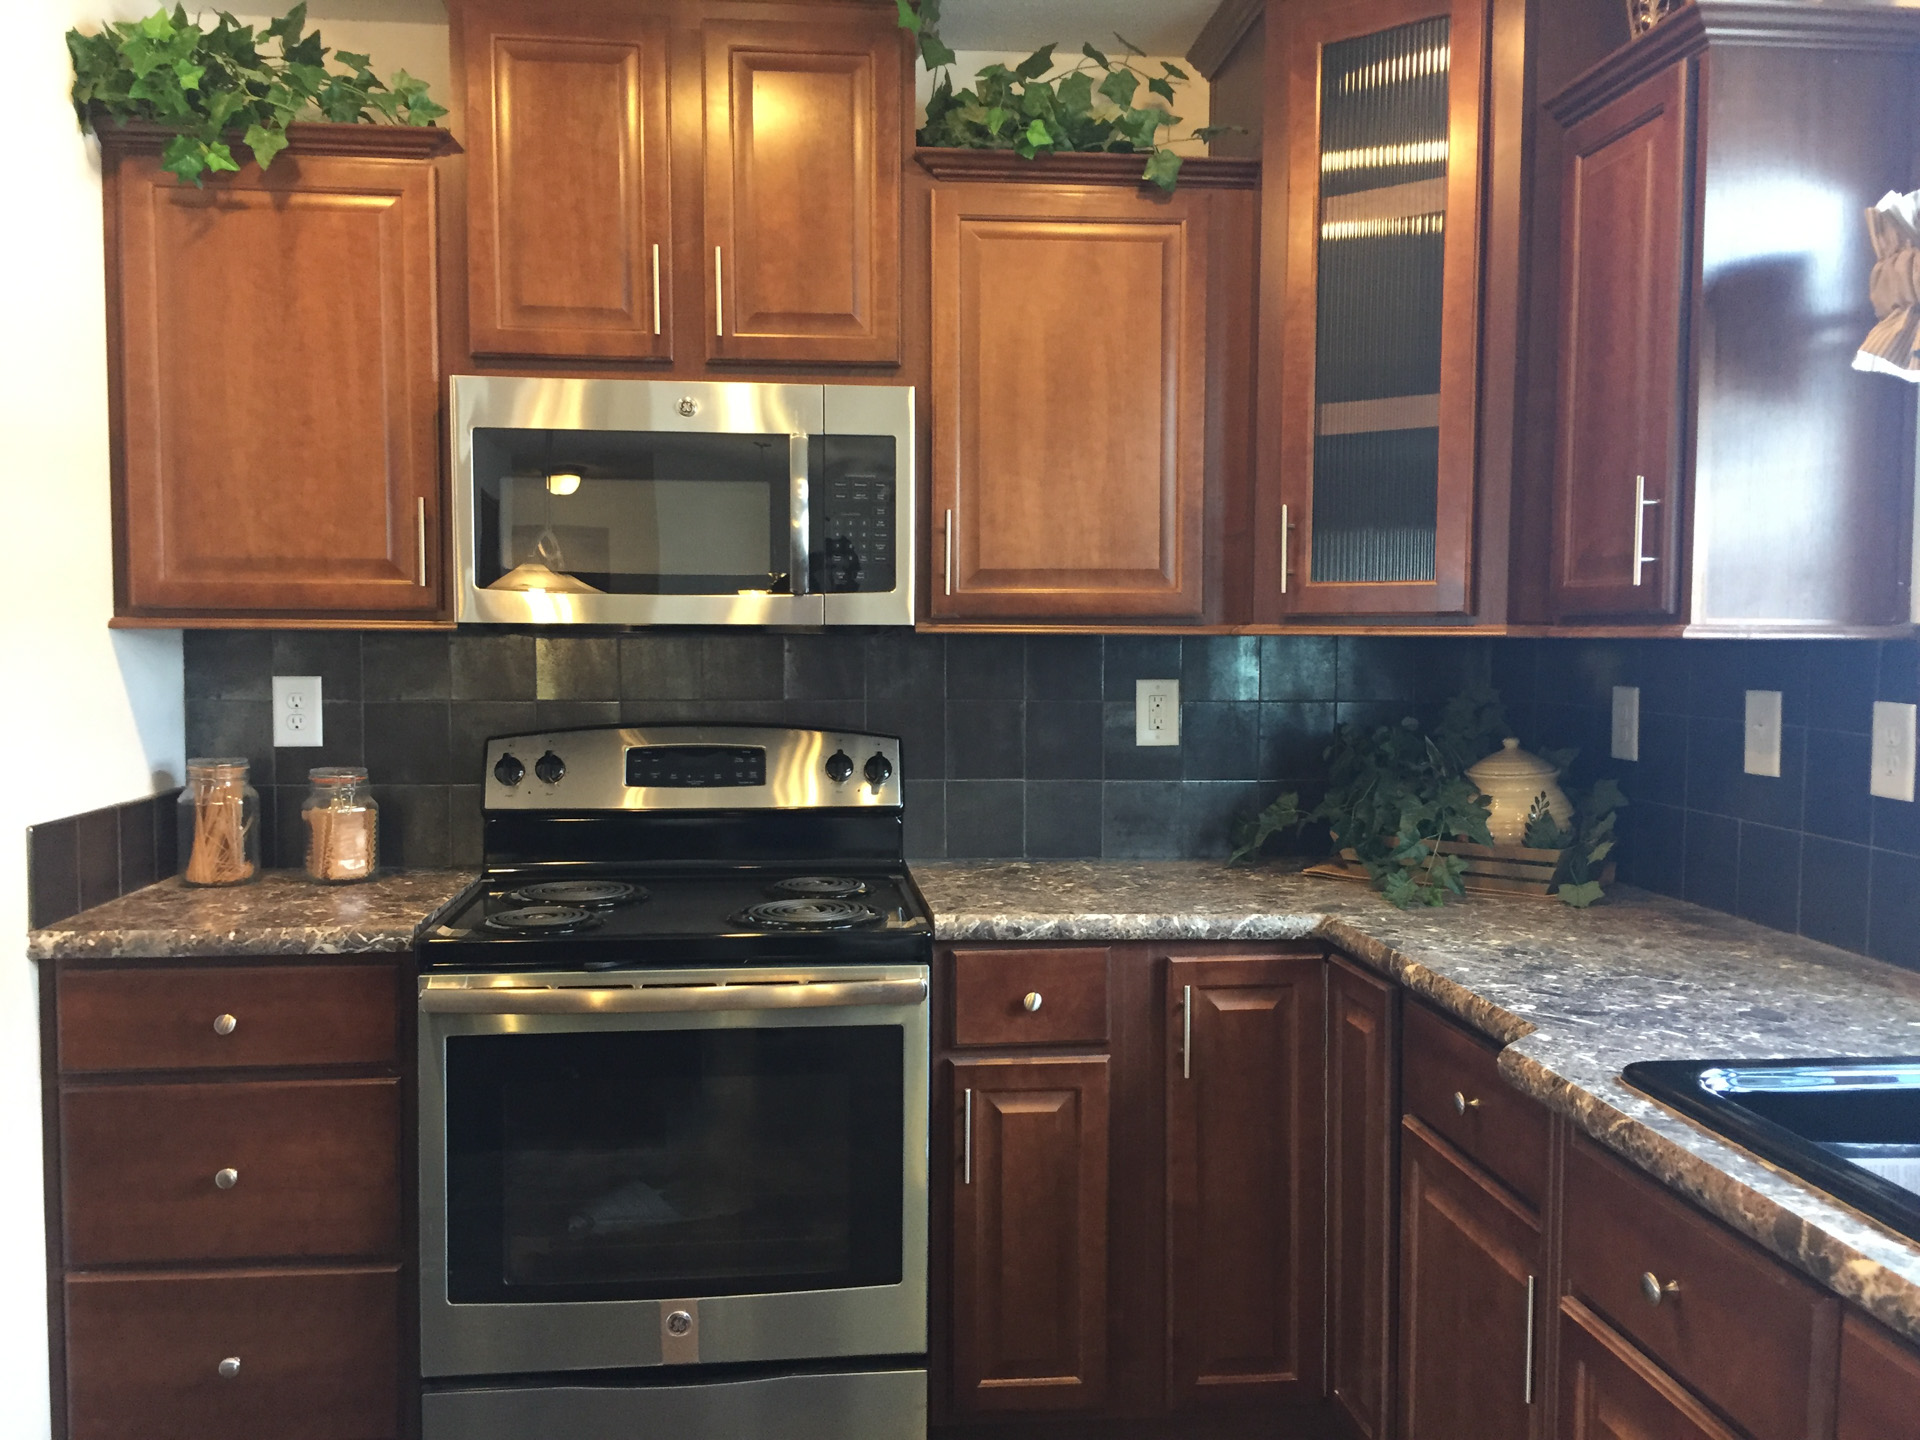 Lionel kitchen cooking area